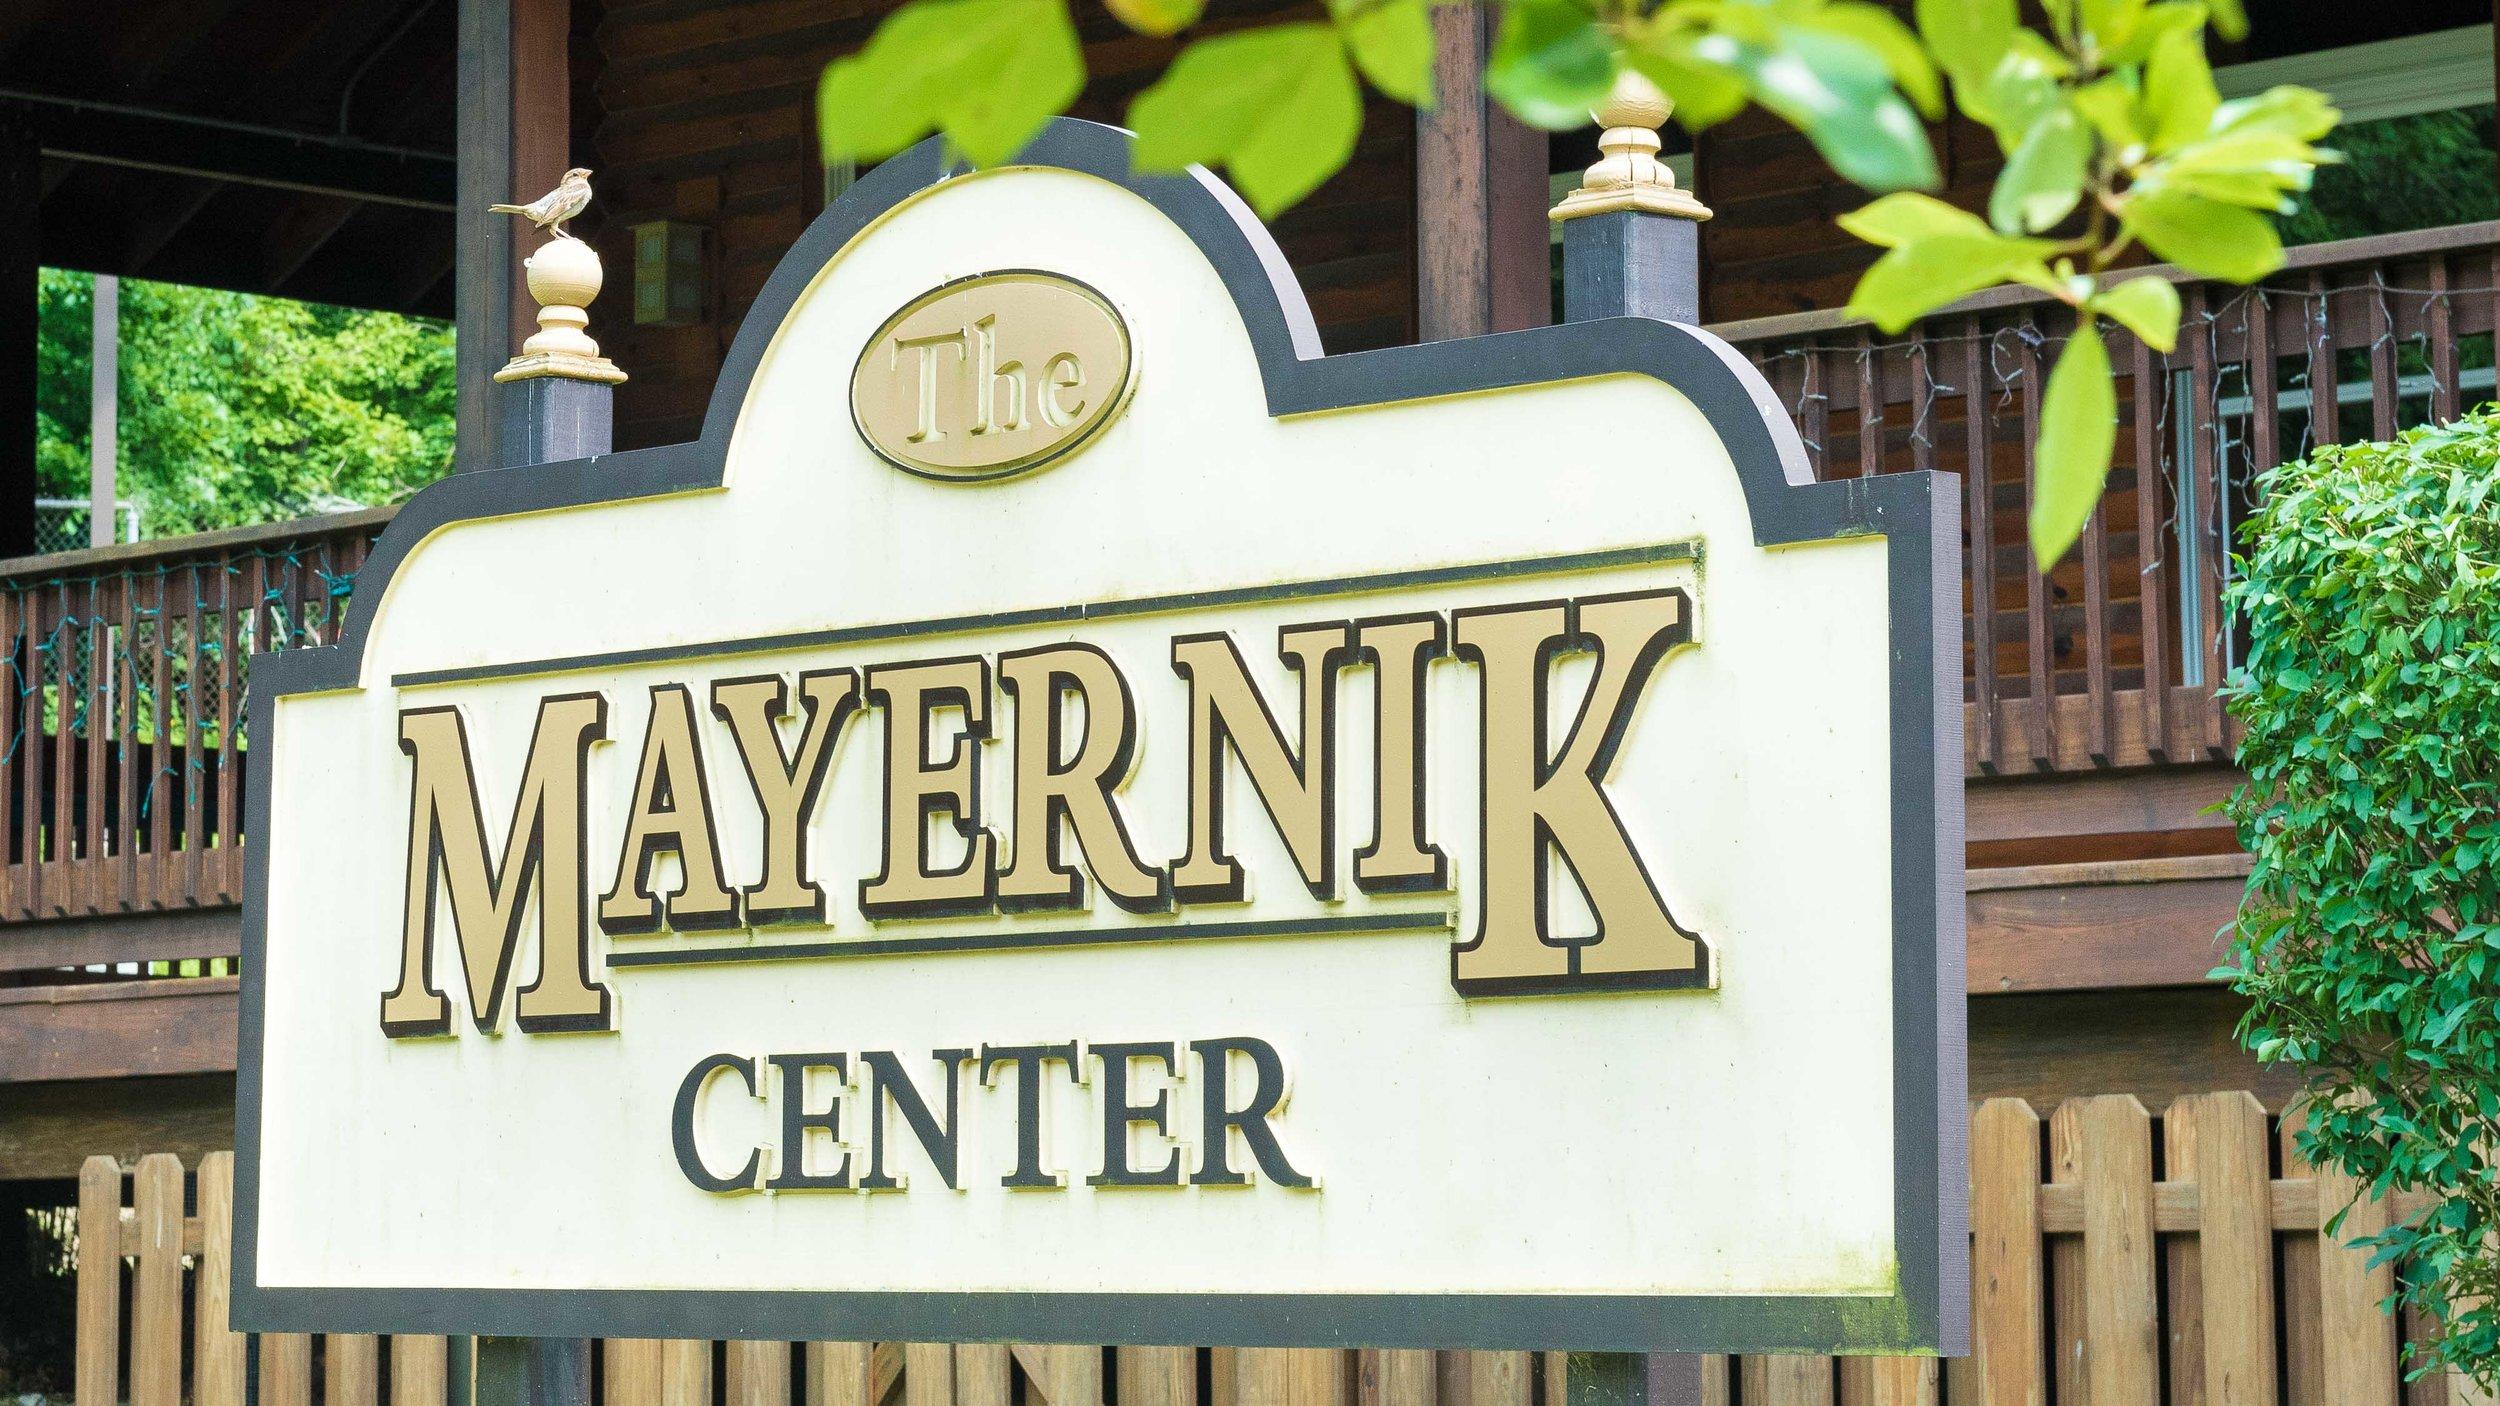 Mayernik-center-sign-wedding-venue-1.jpg